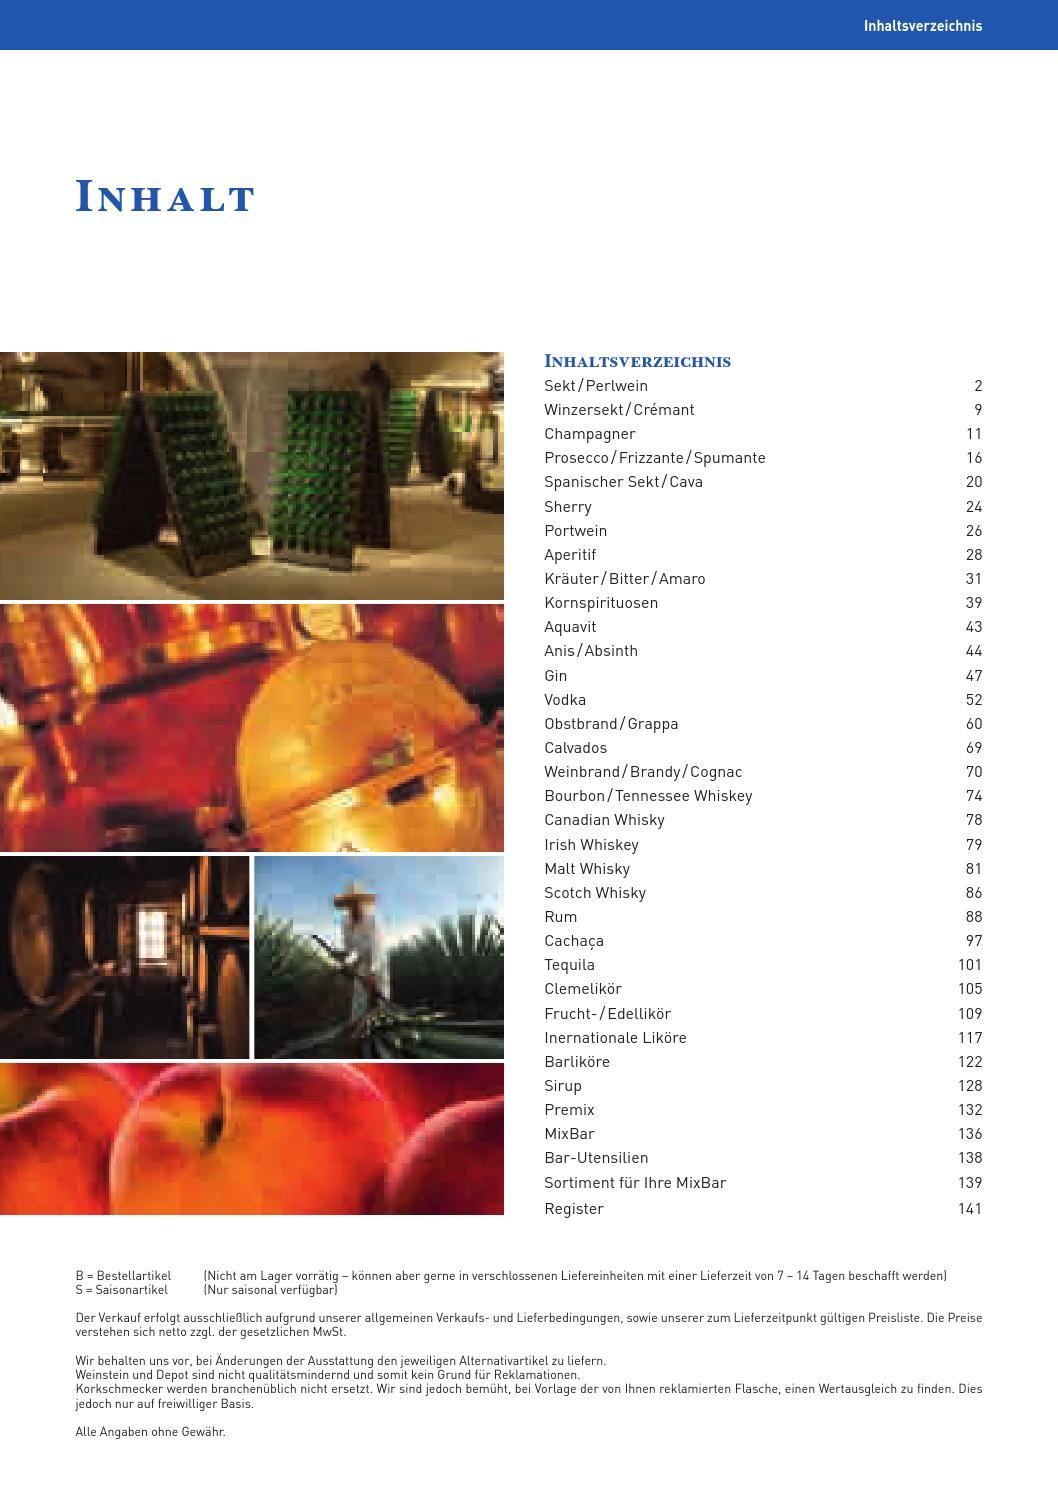 Spirituosenkatalog Ahlers 2014 by marketing wilke - issuu